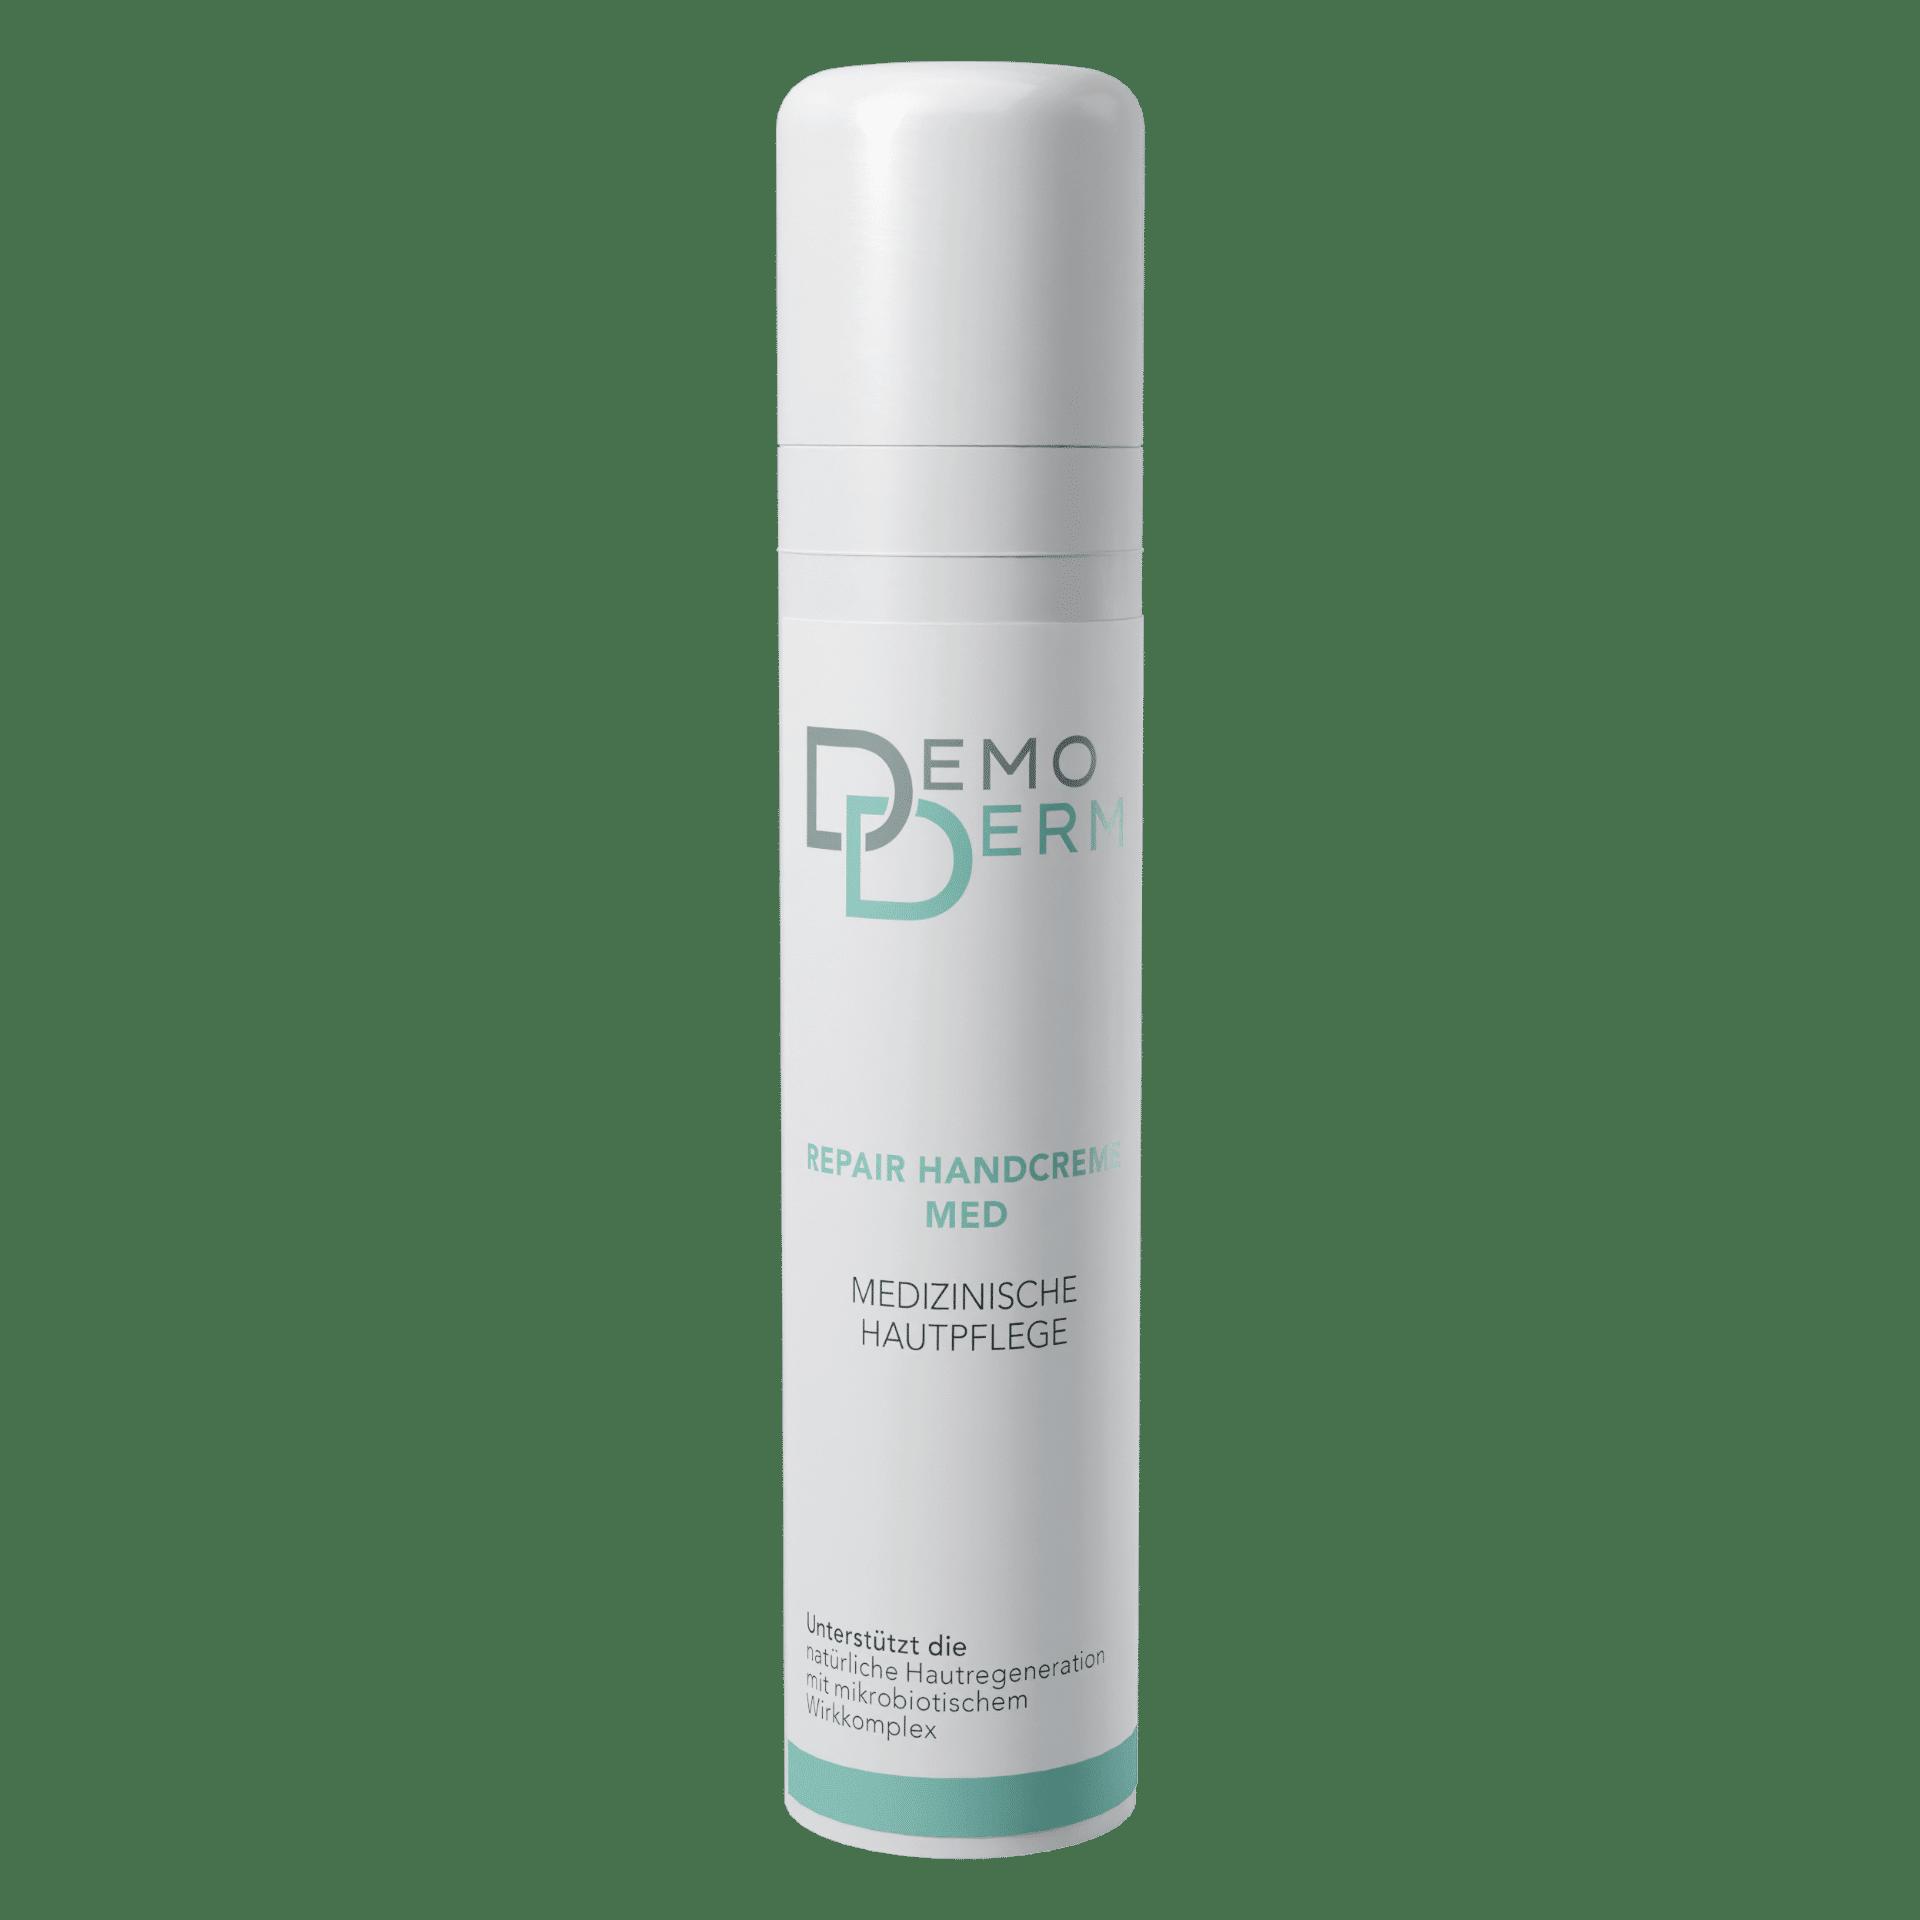 DemoDerm – Repair Handcreme Med – Medizinische Hautpflege